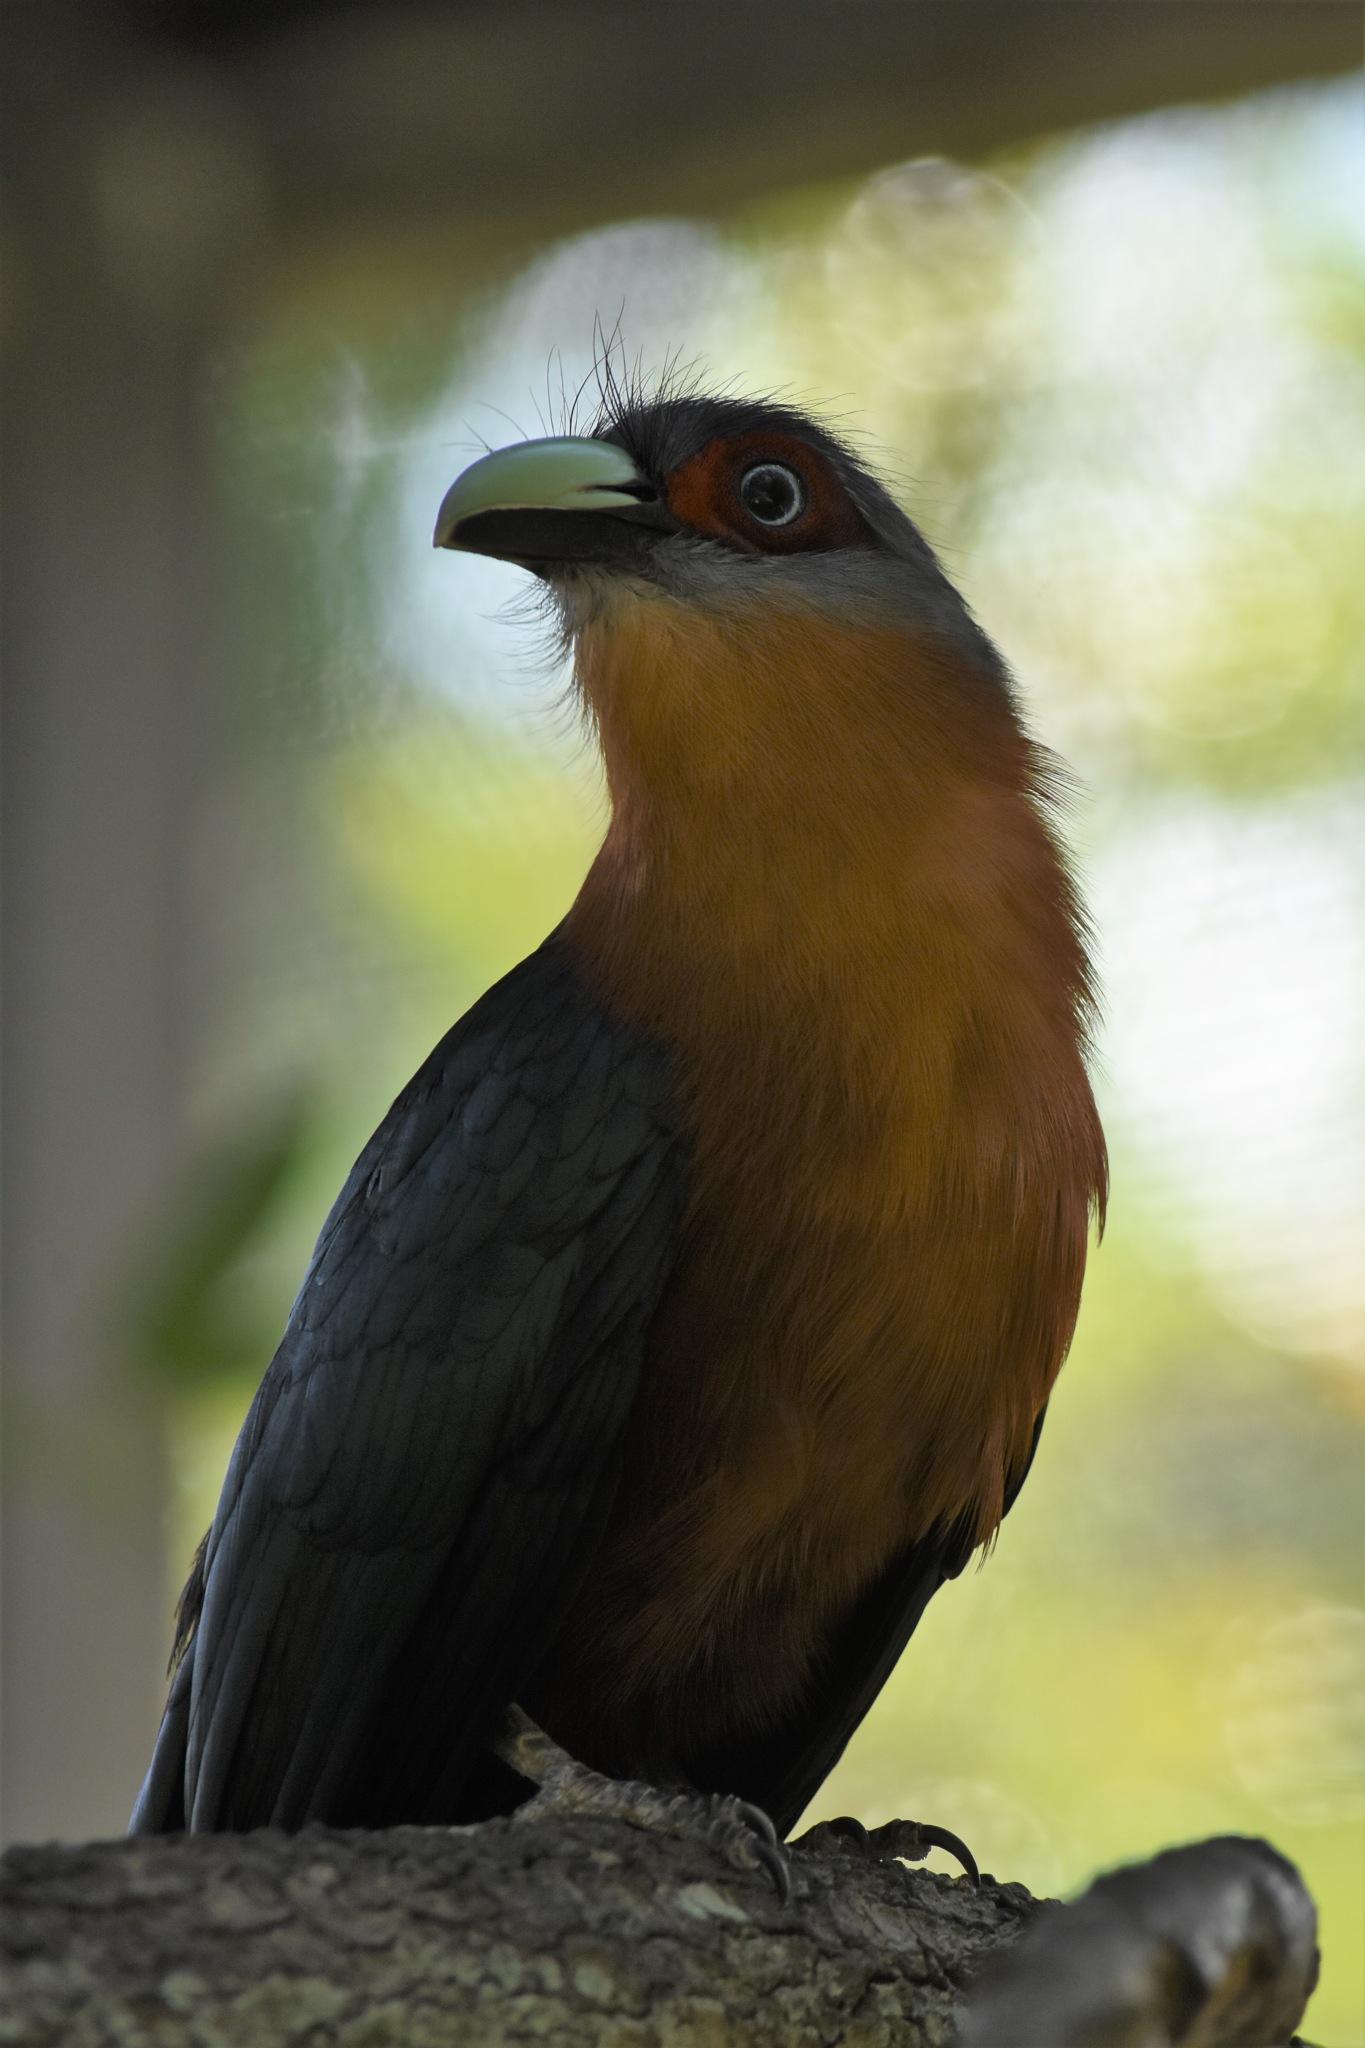 Portrait of a bird by LydiaJeanMay